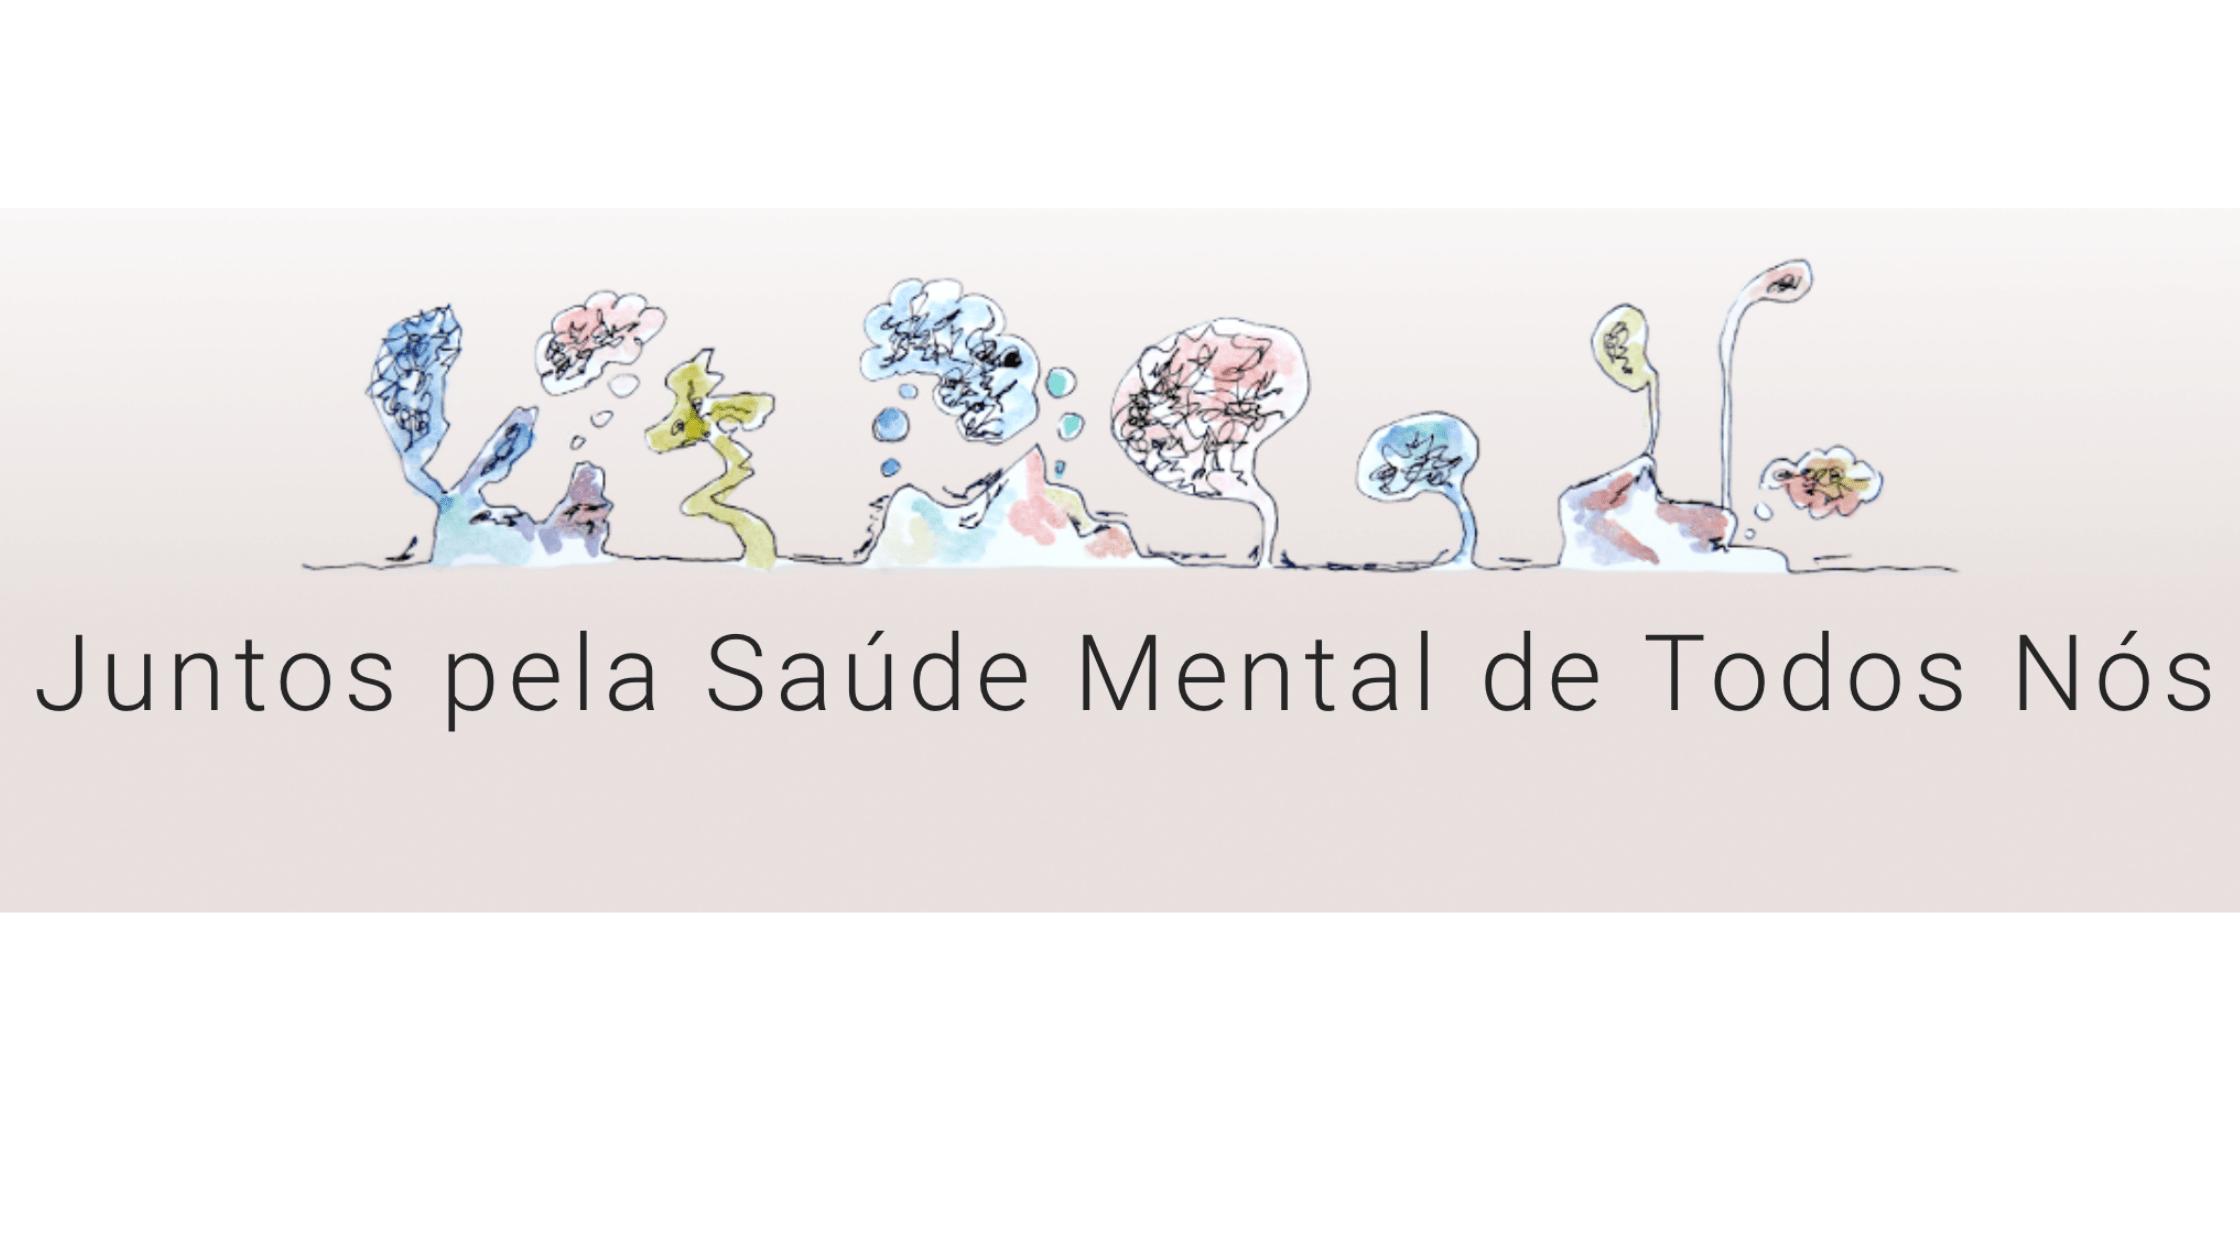 Juntos pela saúde mental de todos